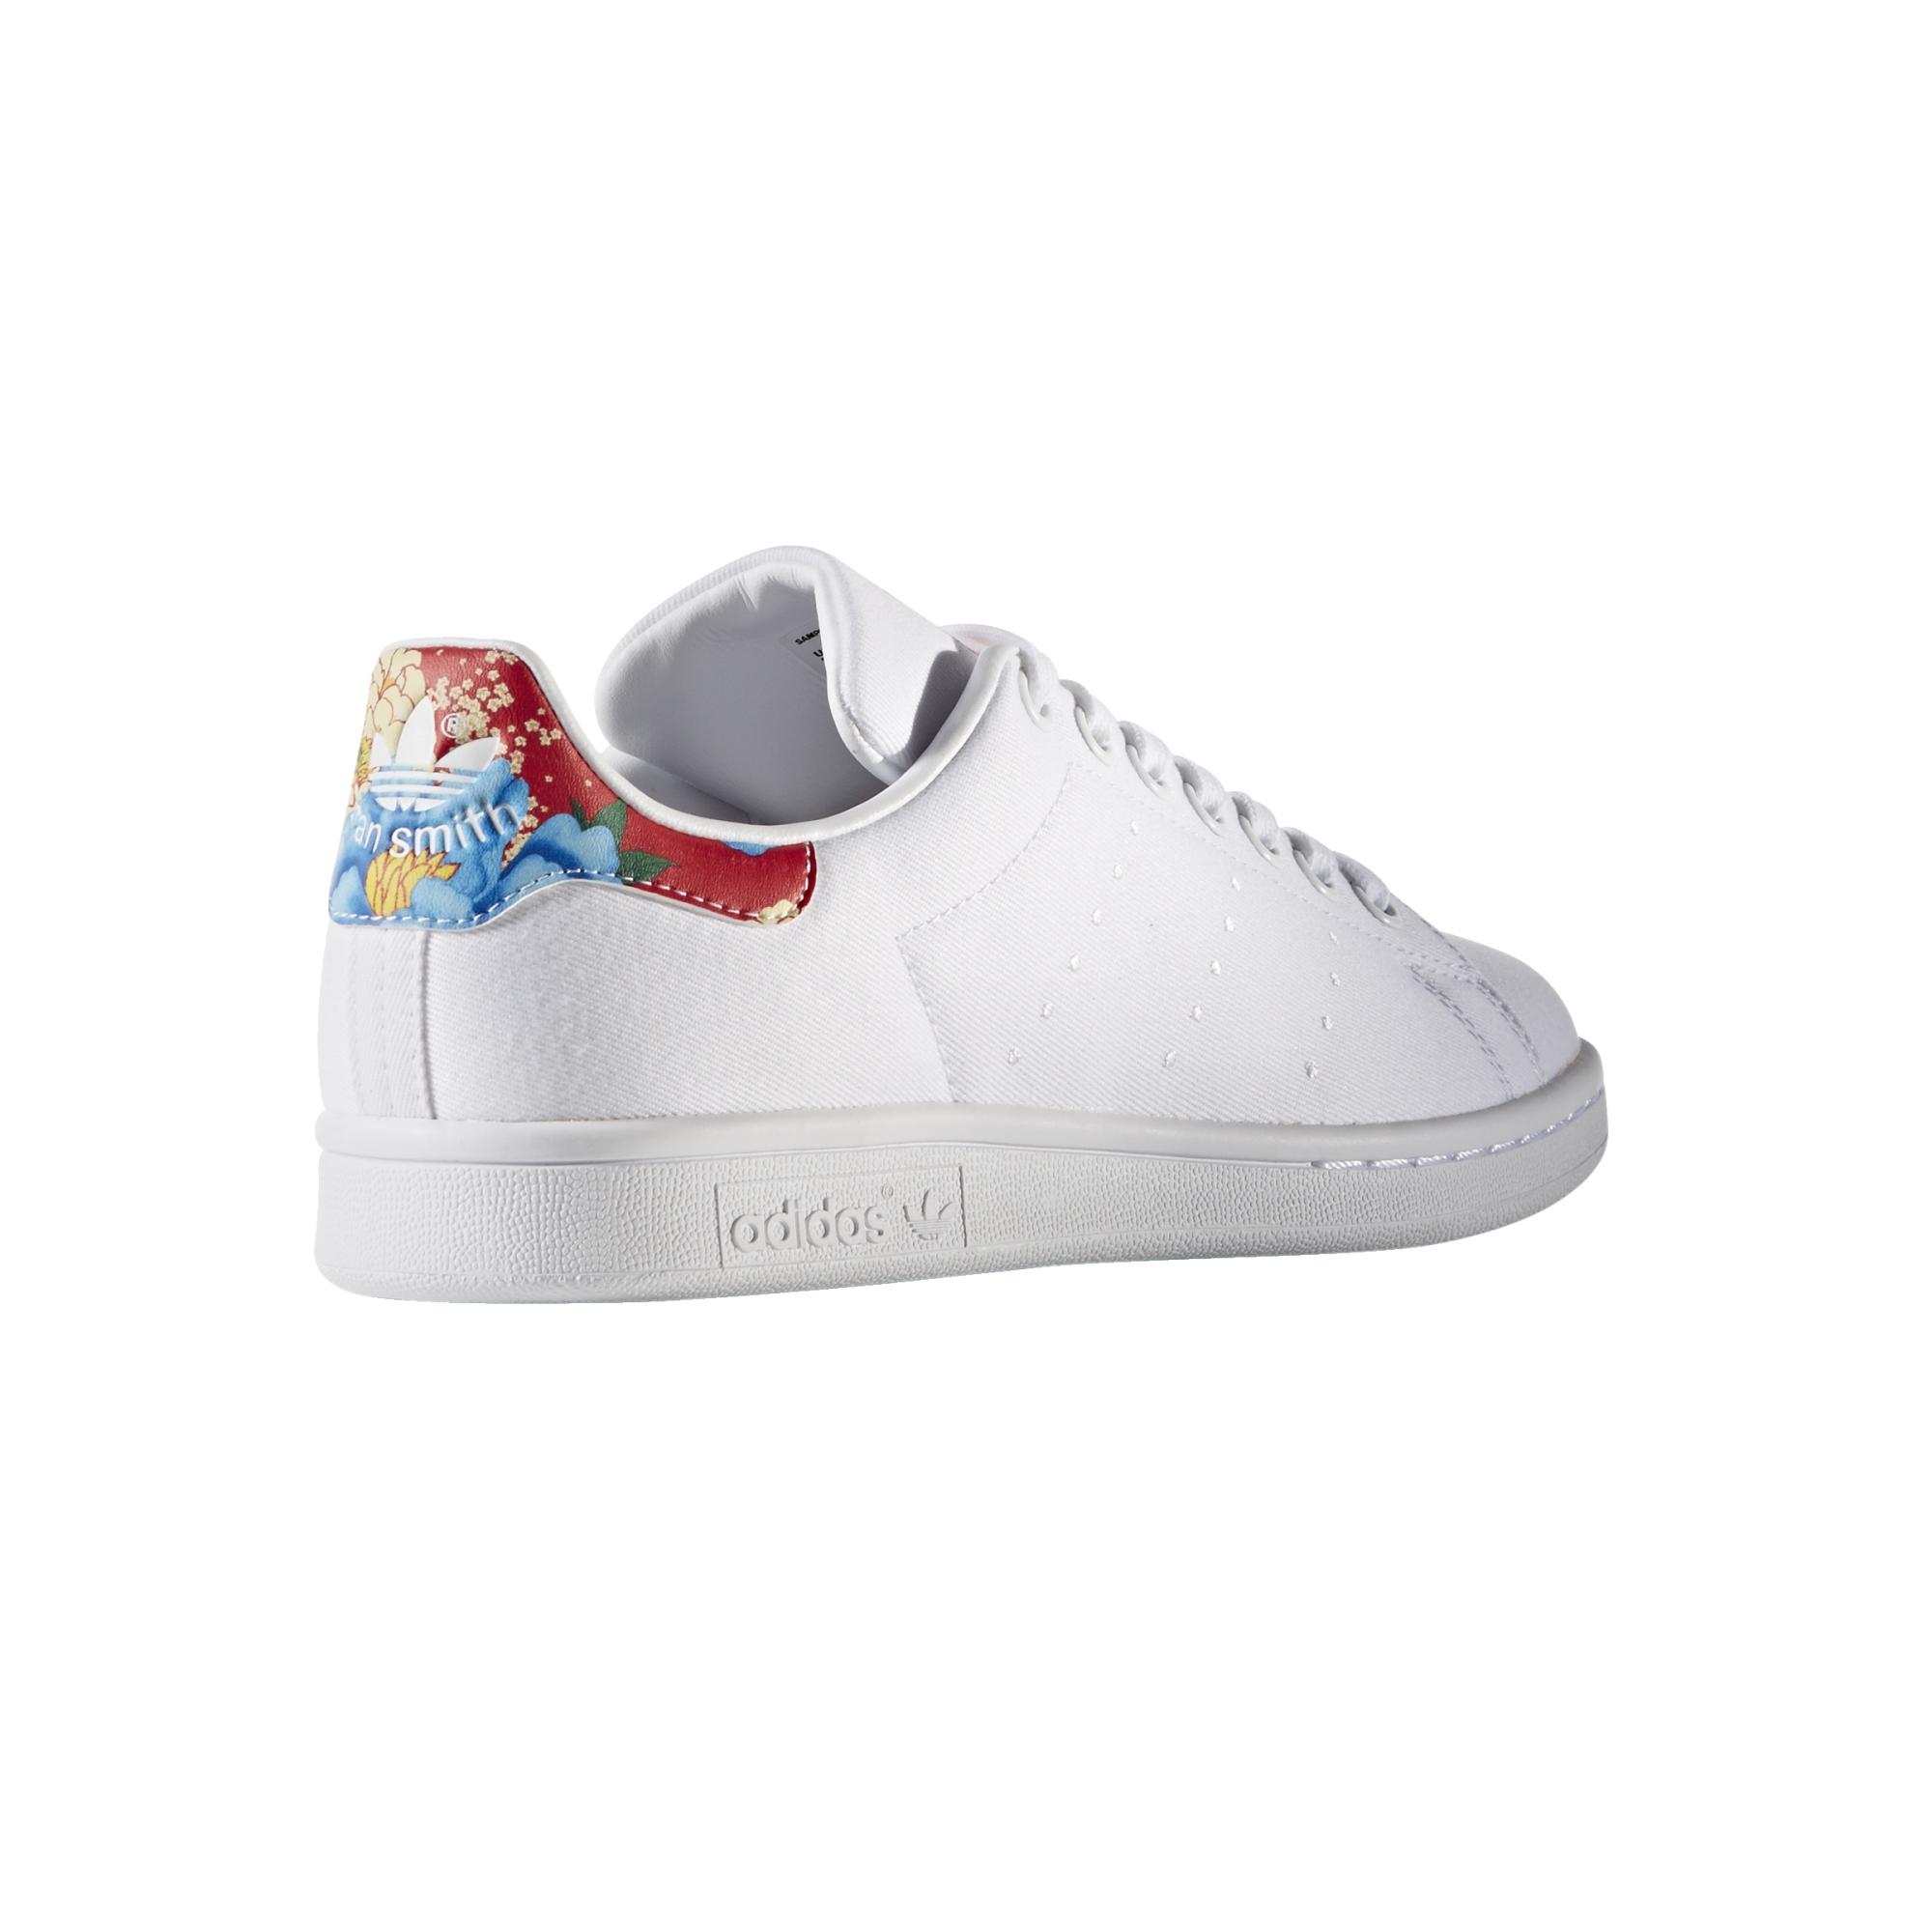 Oriental W Stan Adidas Chita whitepower Originals Smith Red xOxUwBXq